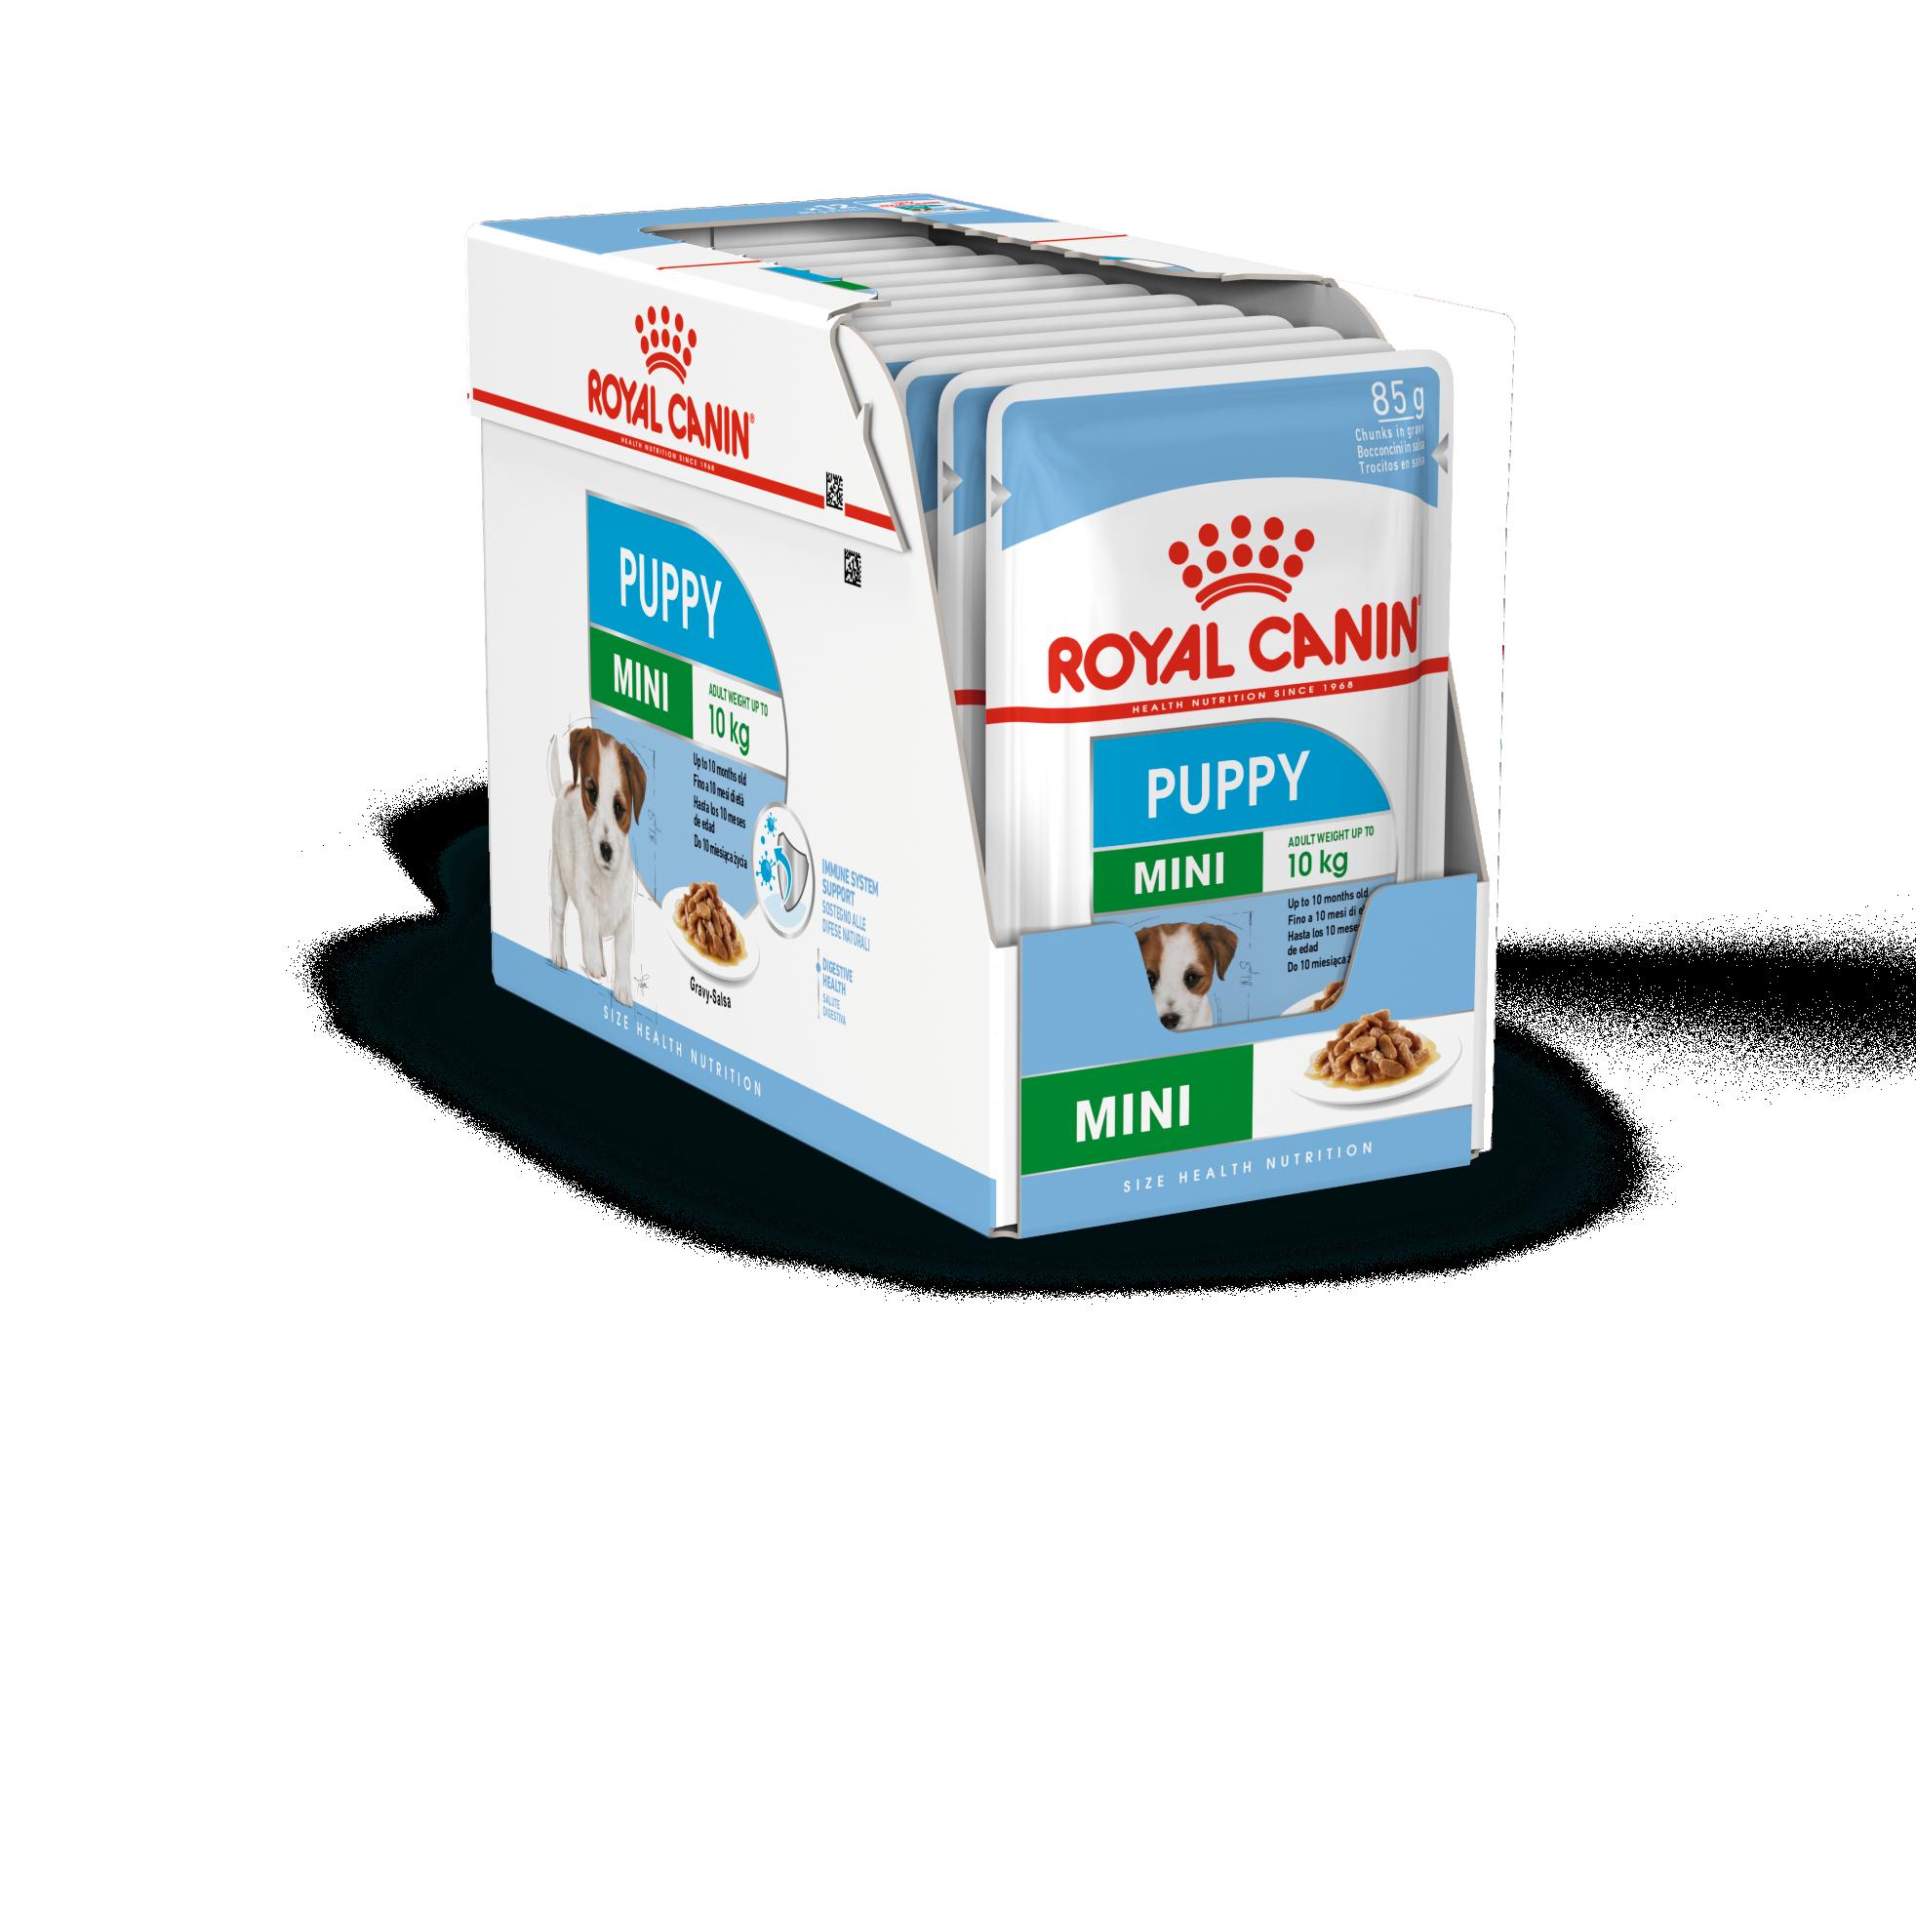 rc-mini-puppy-box